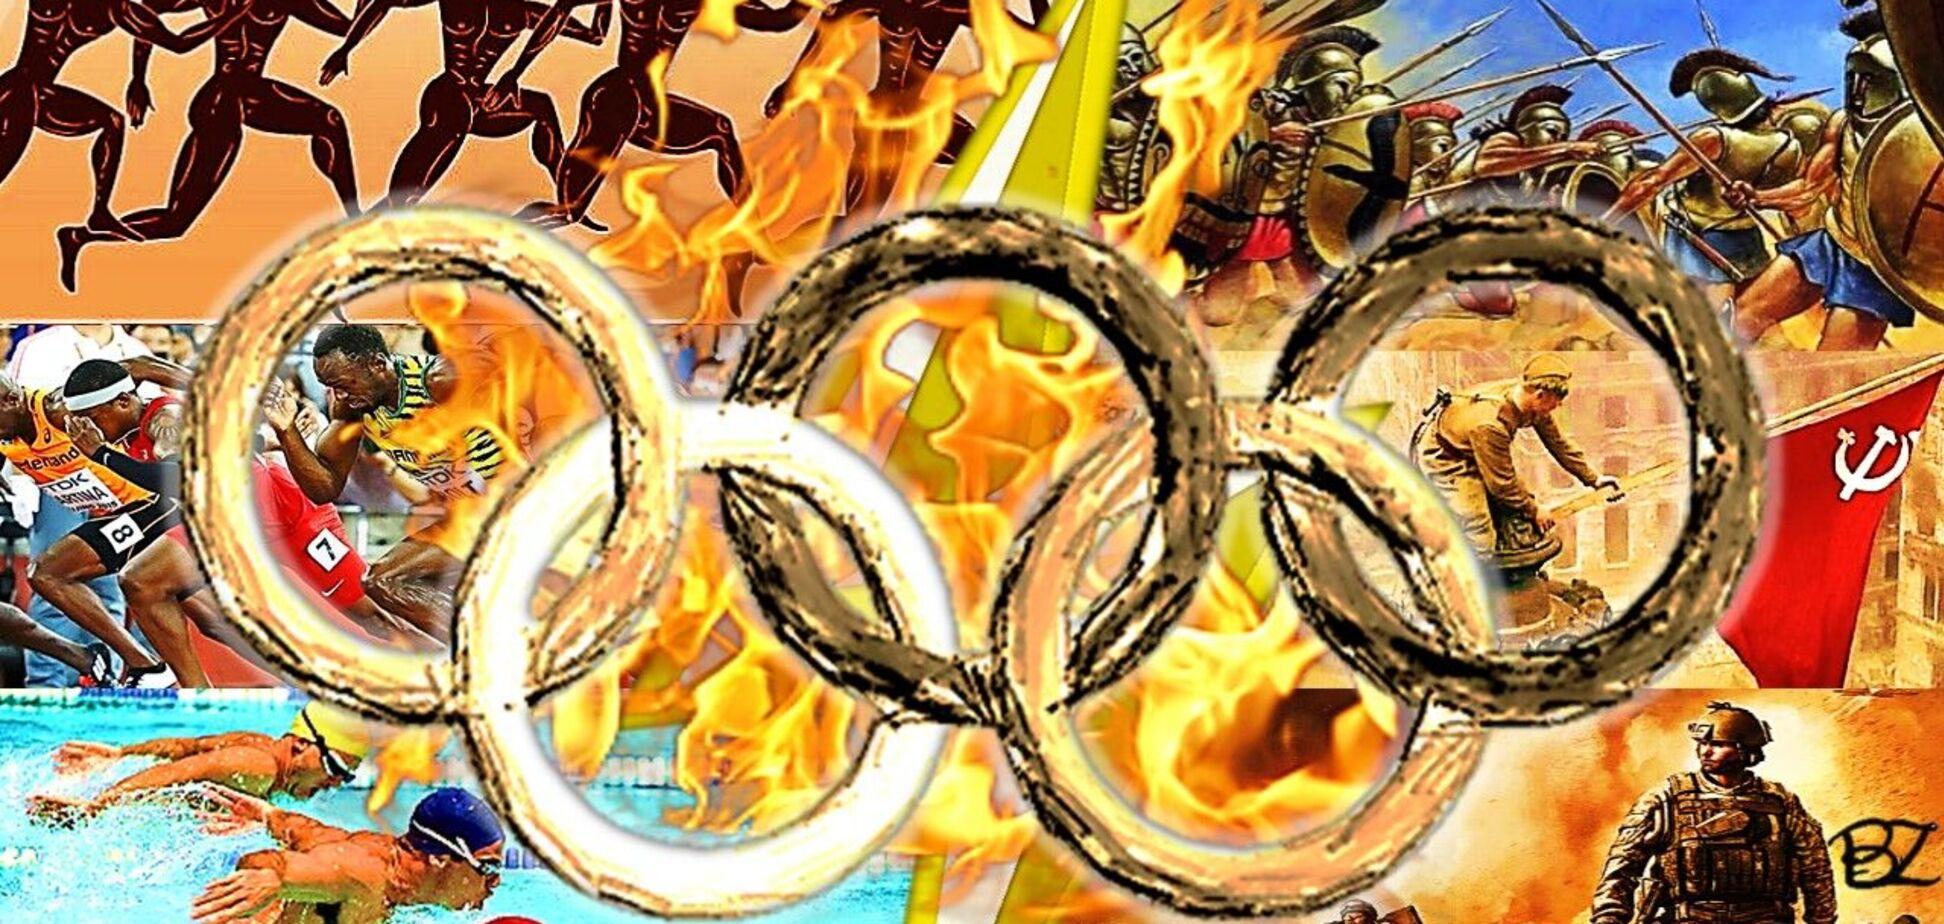 Еще раз об Олимпийских играх, или Спорт – это политика